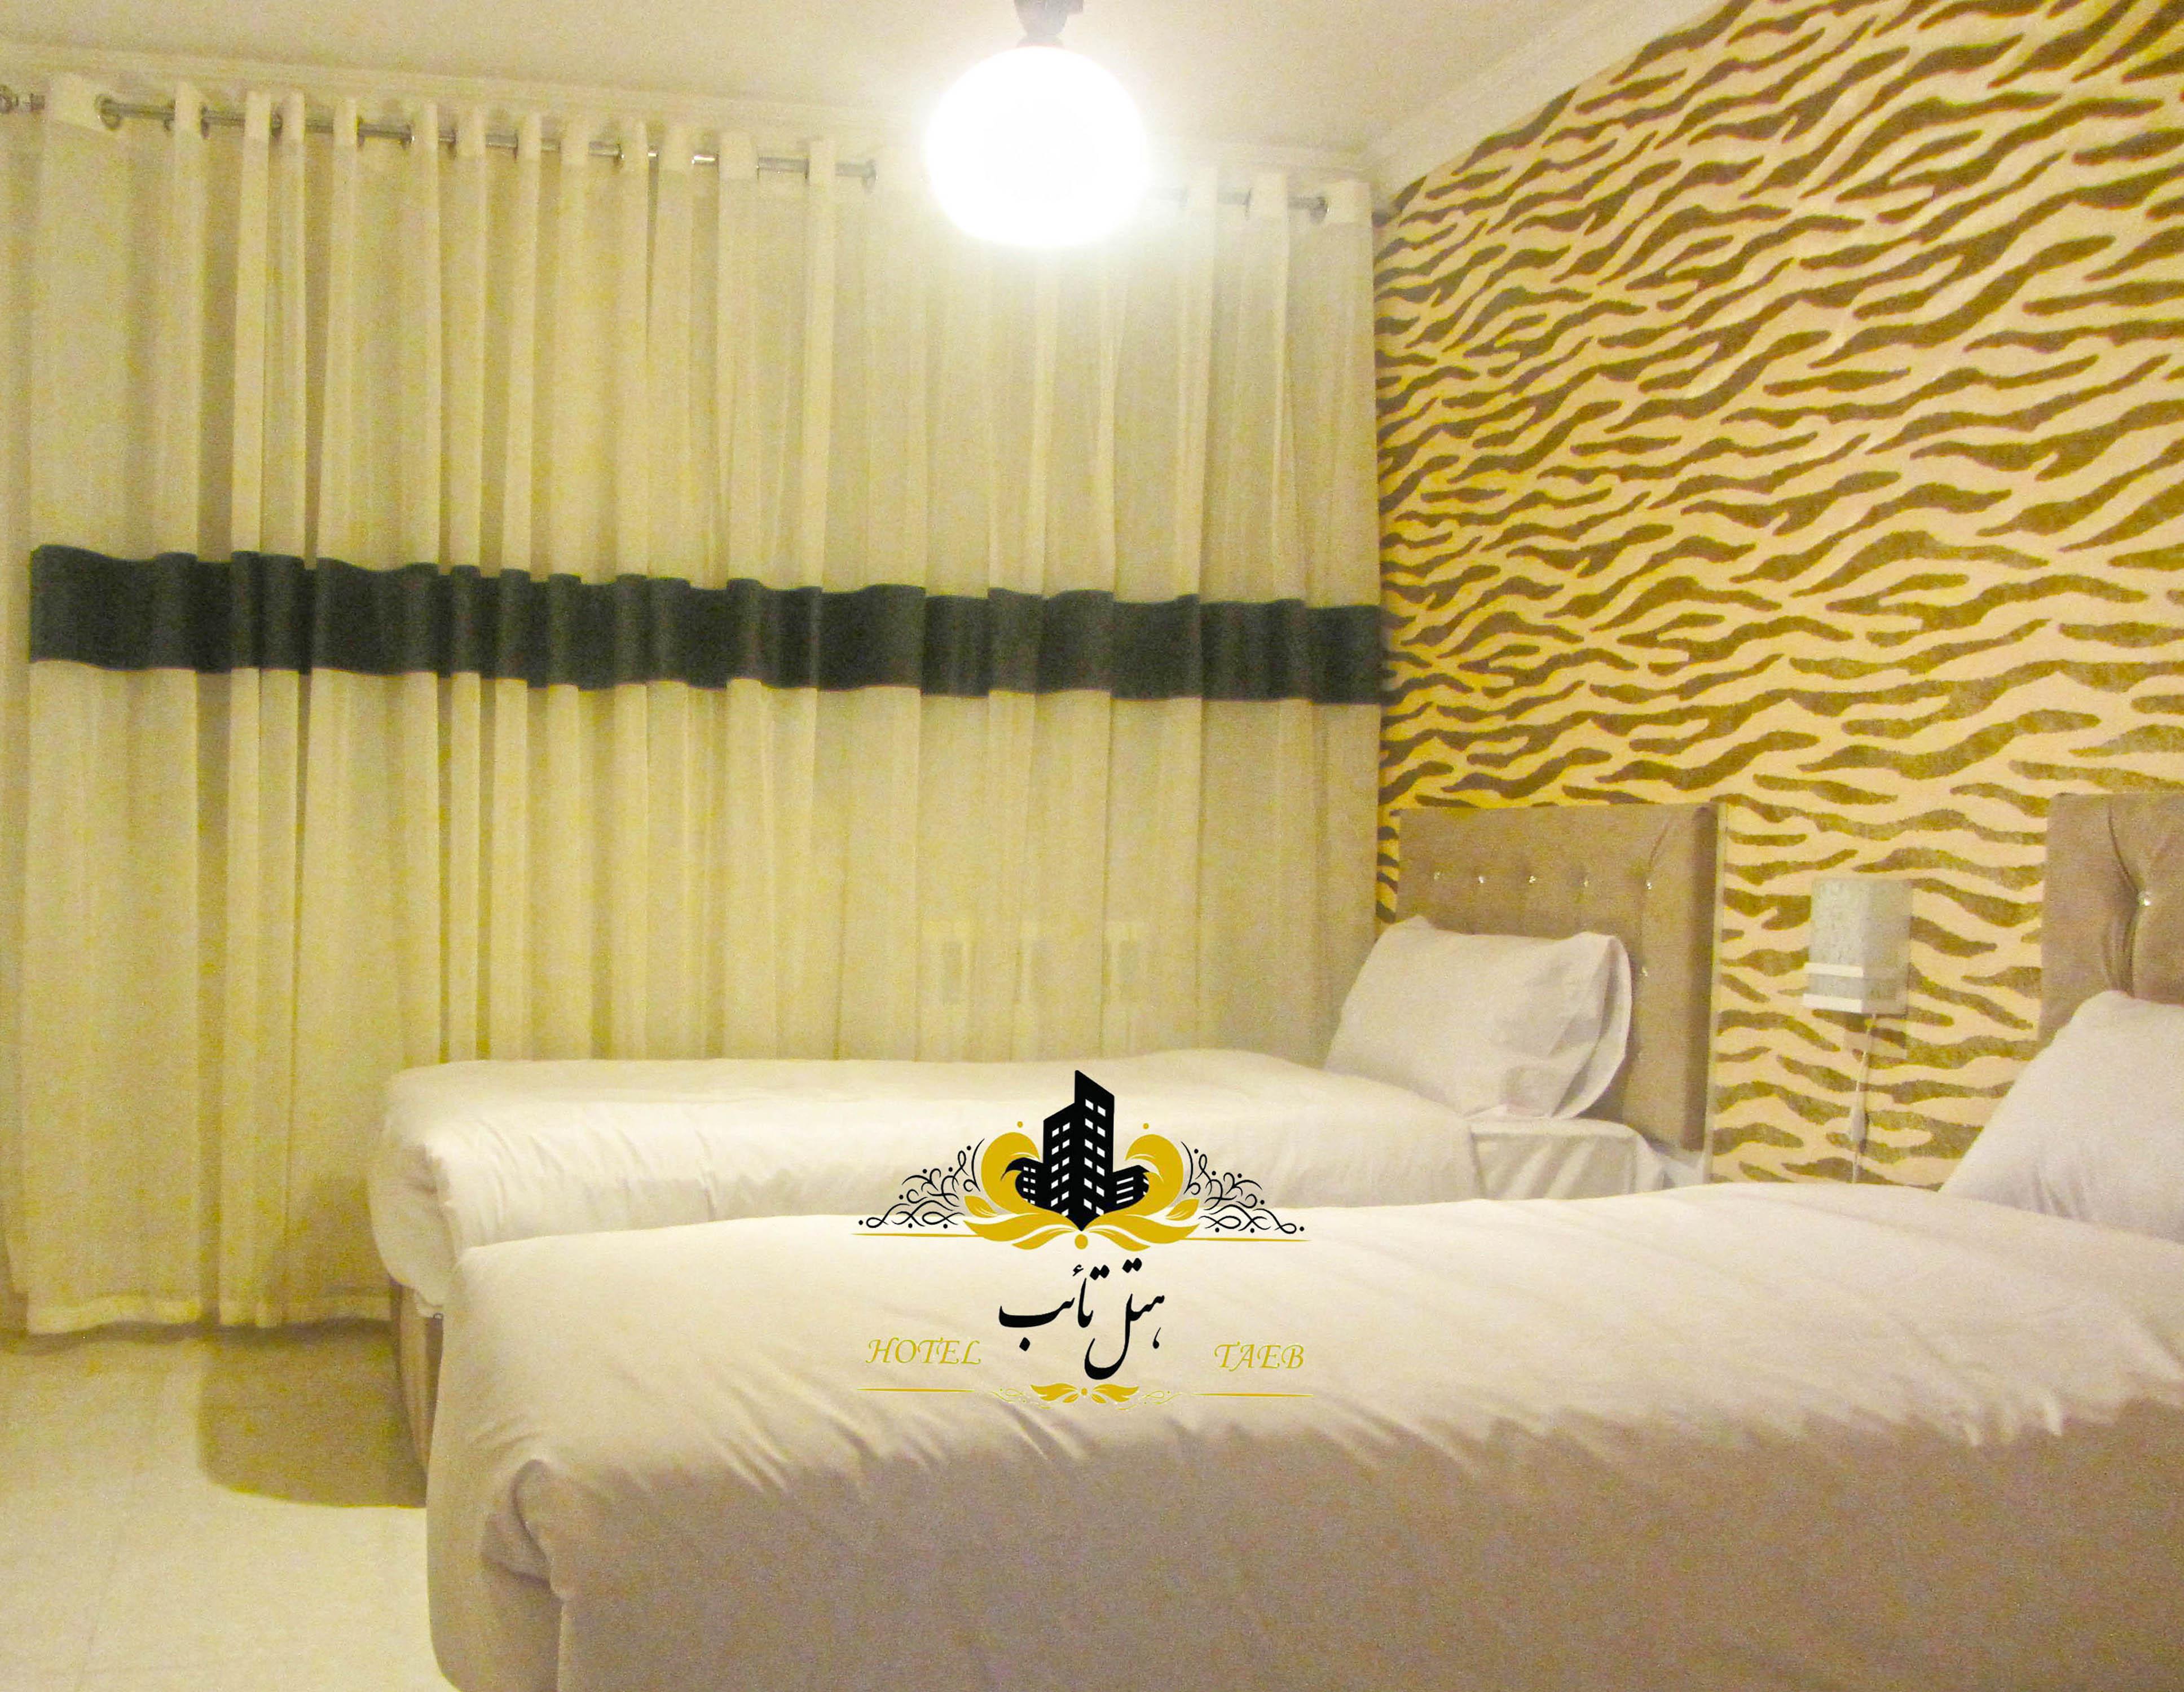 هتل تائب